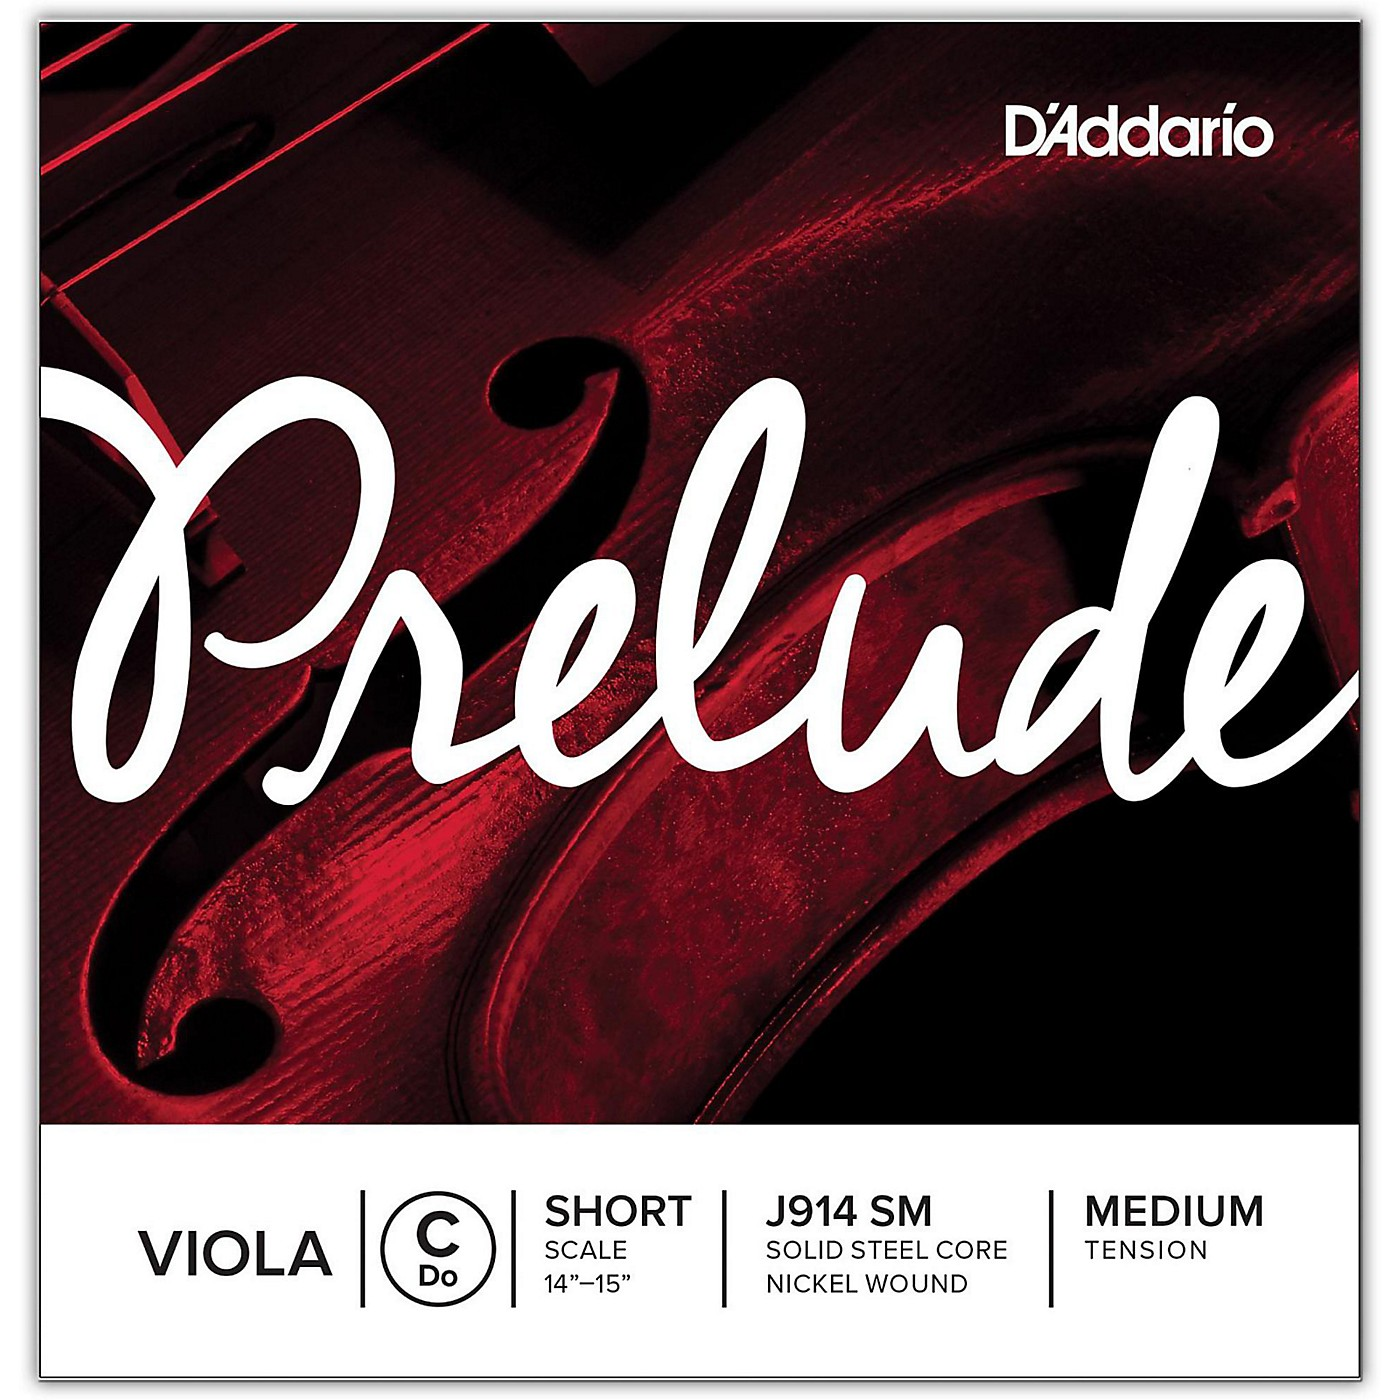 D'Addario Prelude Series Viola C String thumbnail